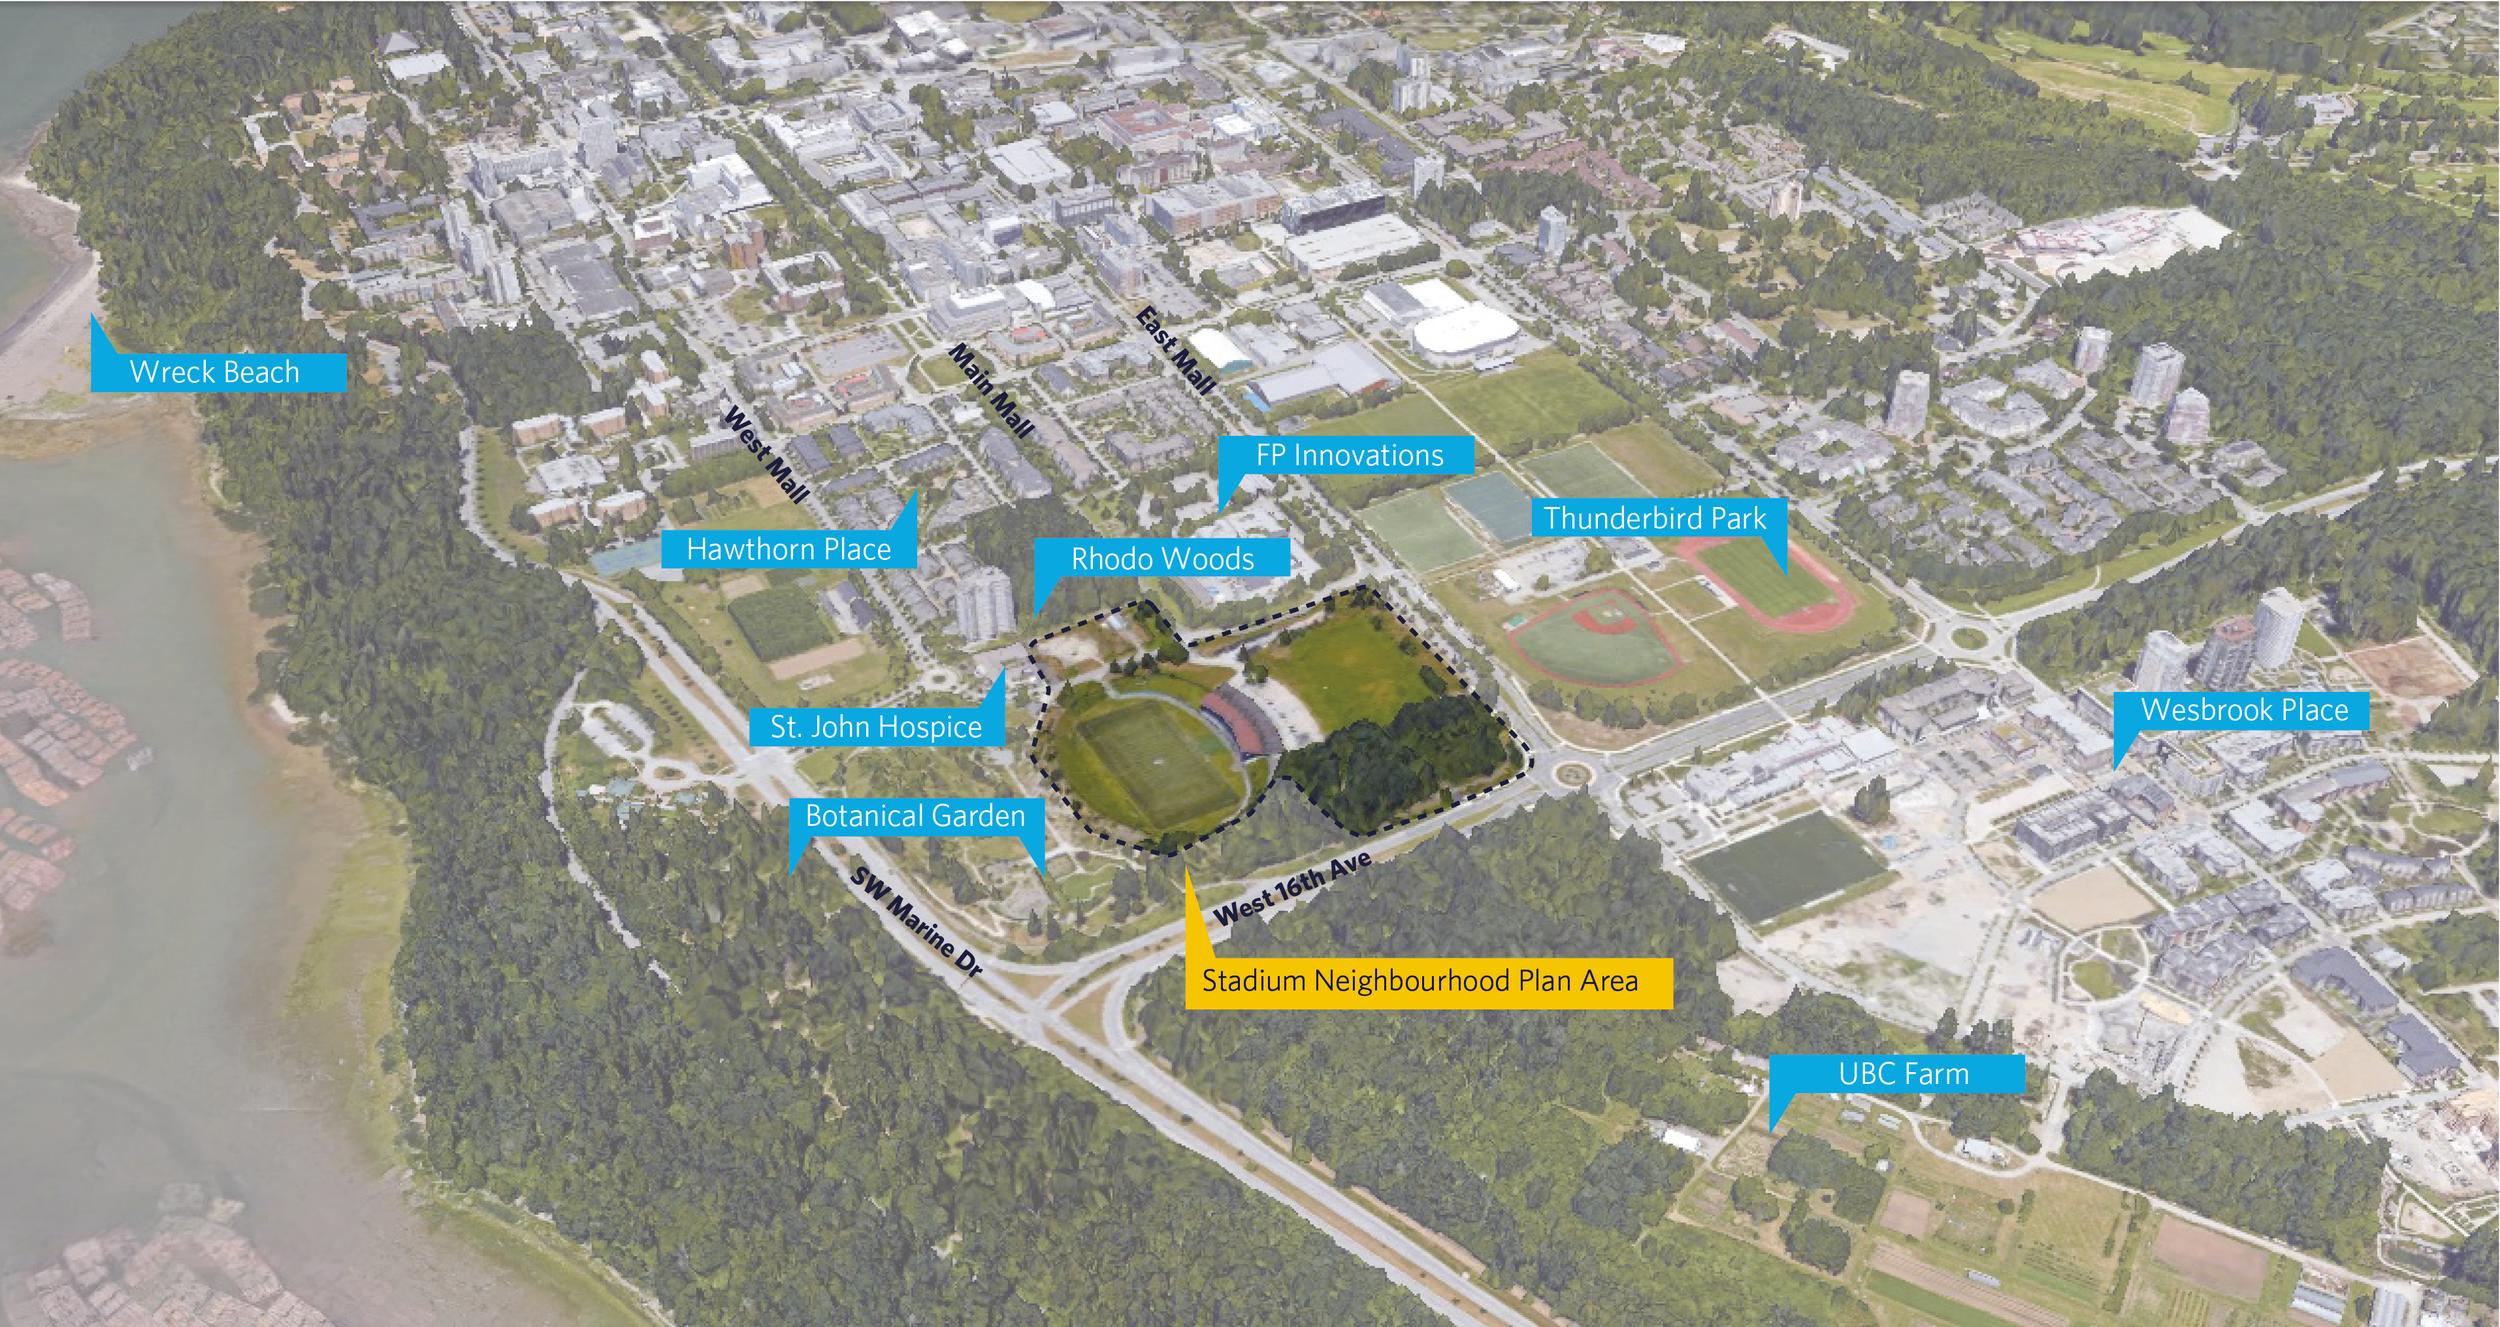 The Stadium Neighbourhood Plan area and adjacencies